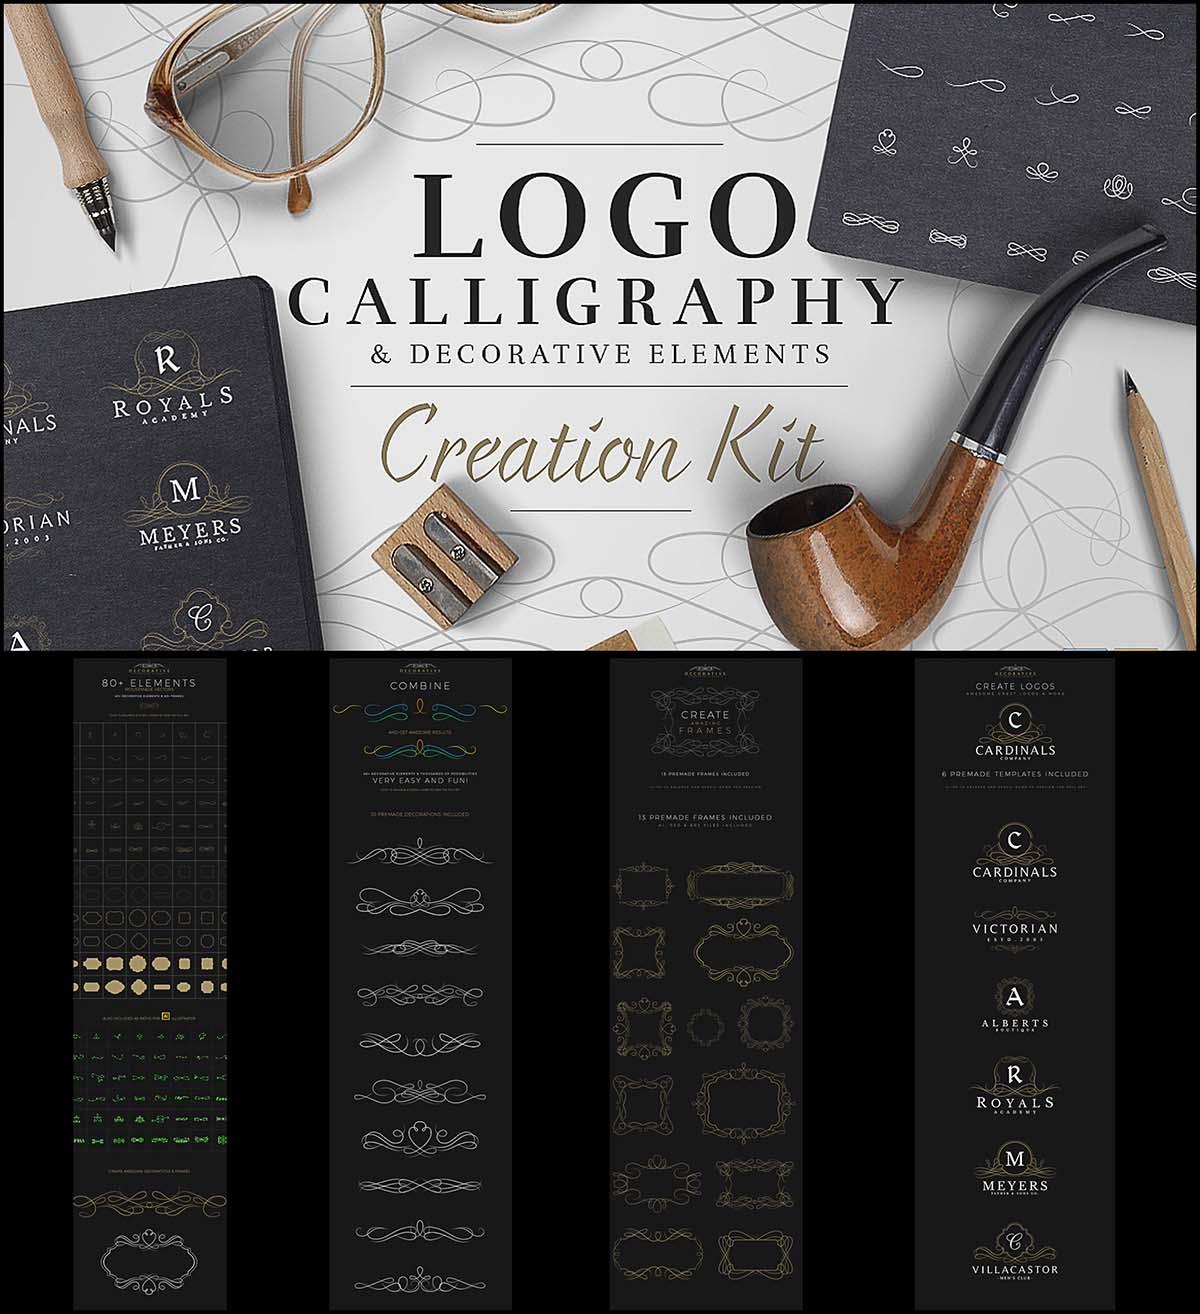 Caliigraphy logo creation kit